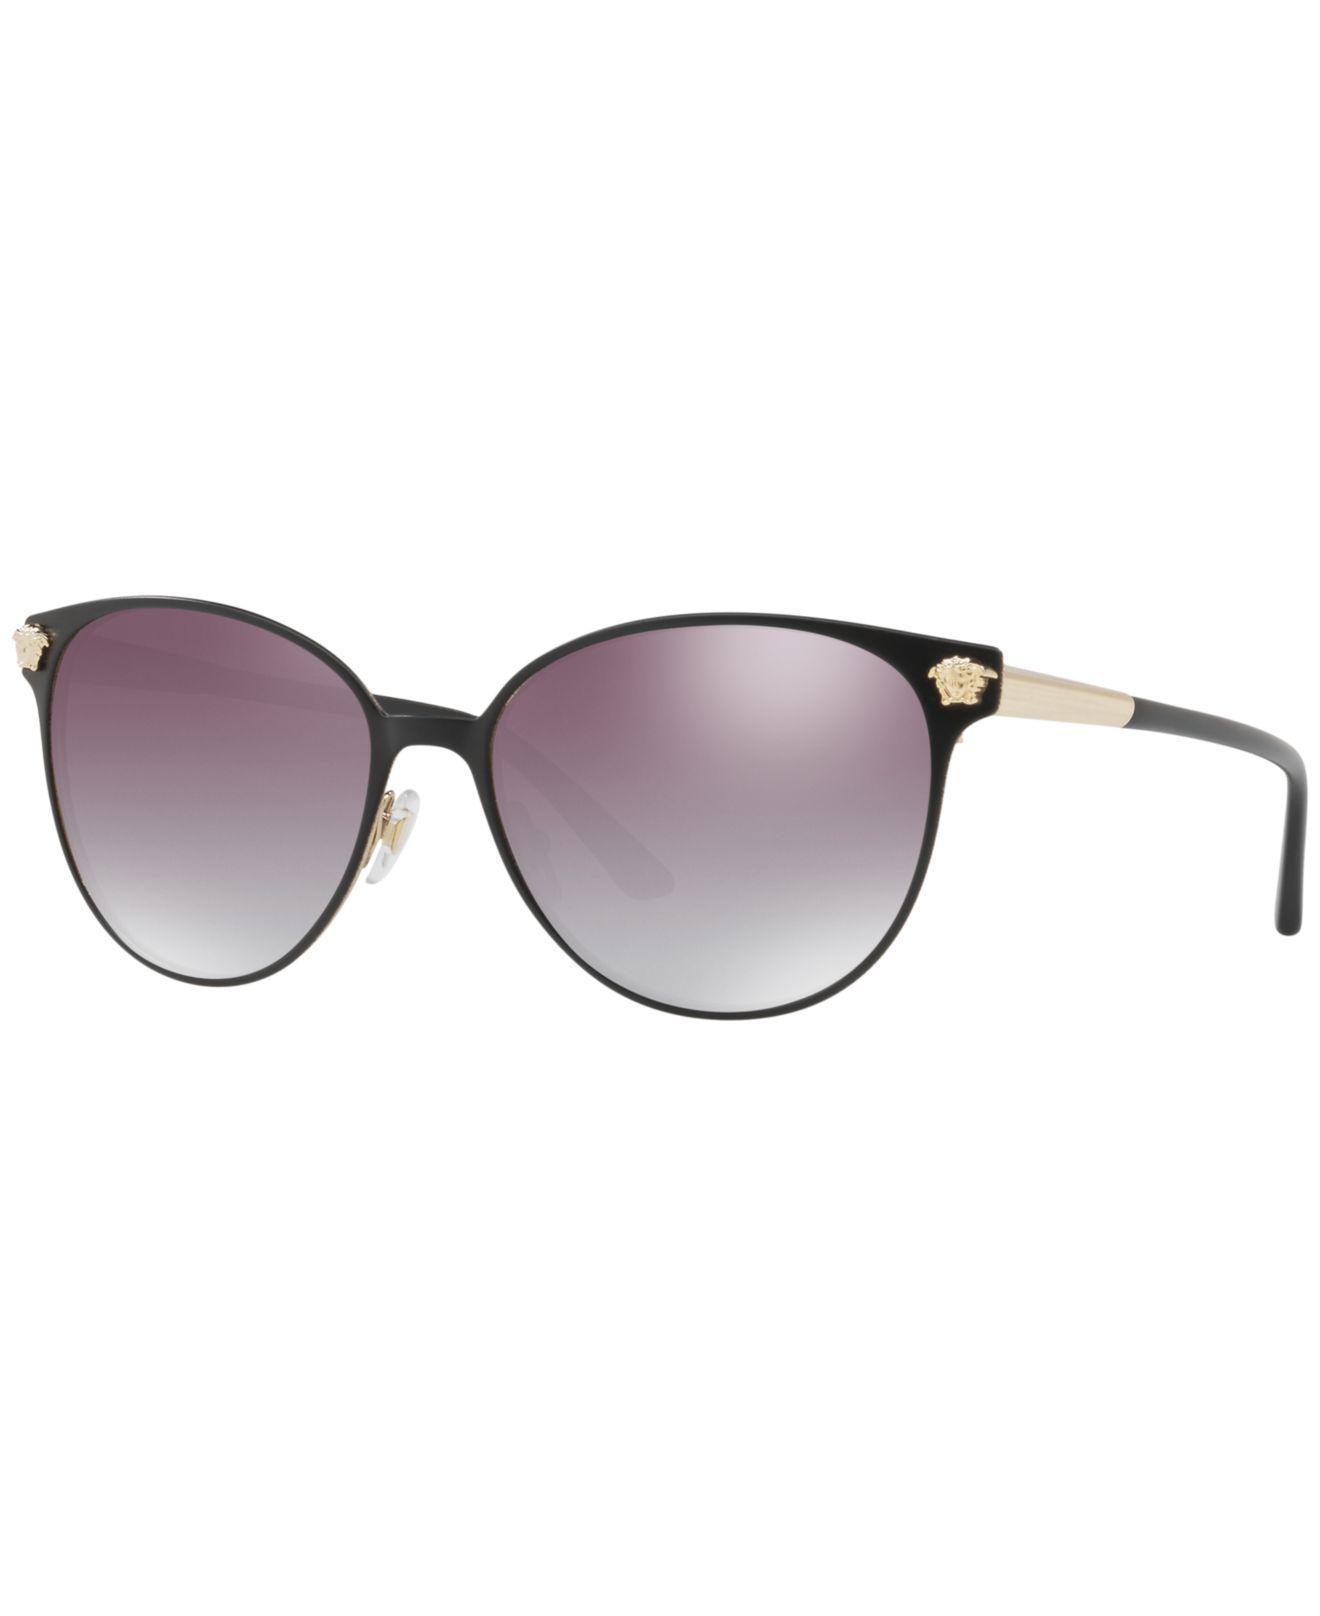 34597a8a4af8d Versace. Women s Brown Sunglasses ...